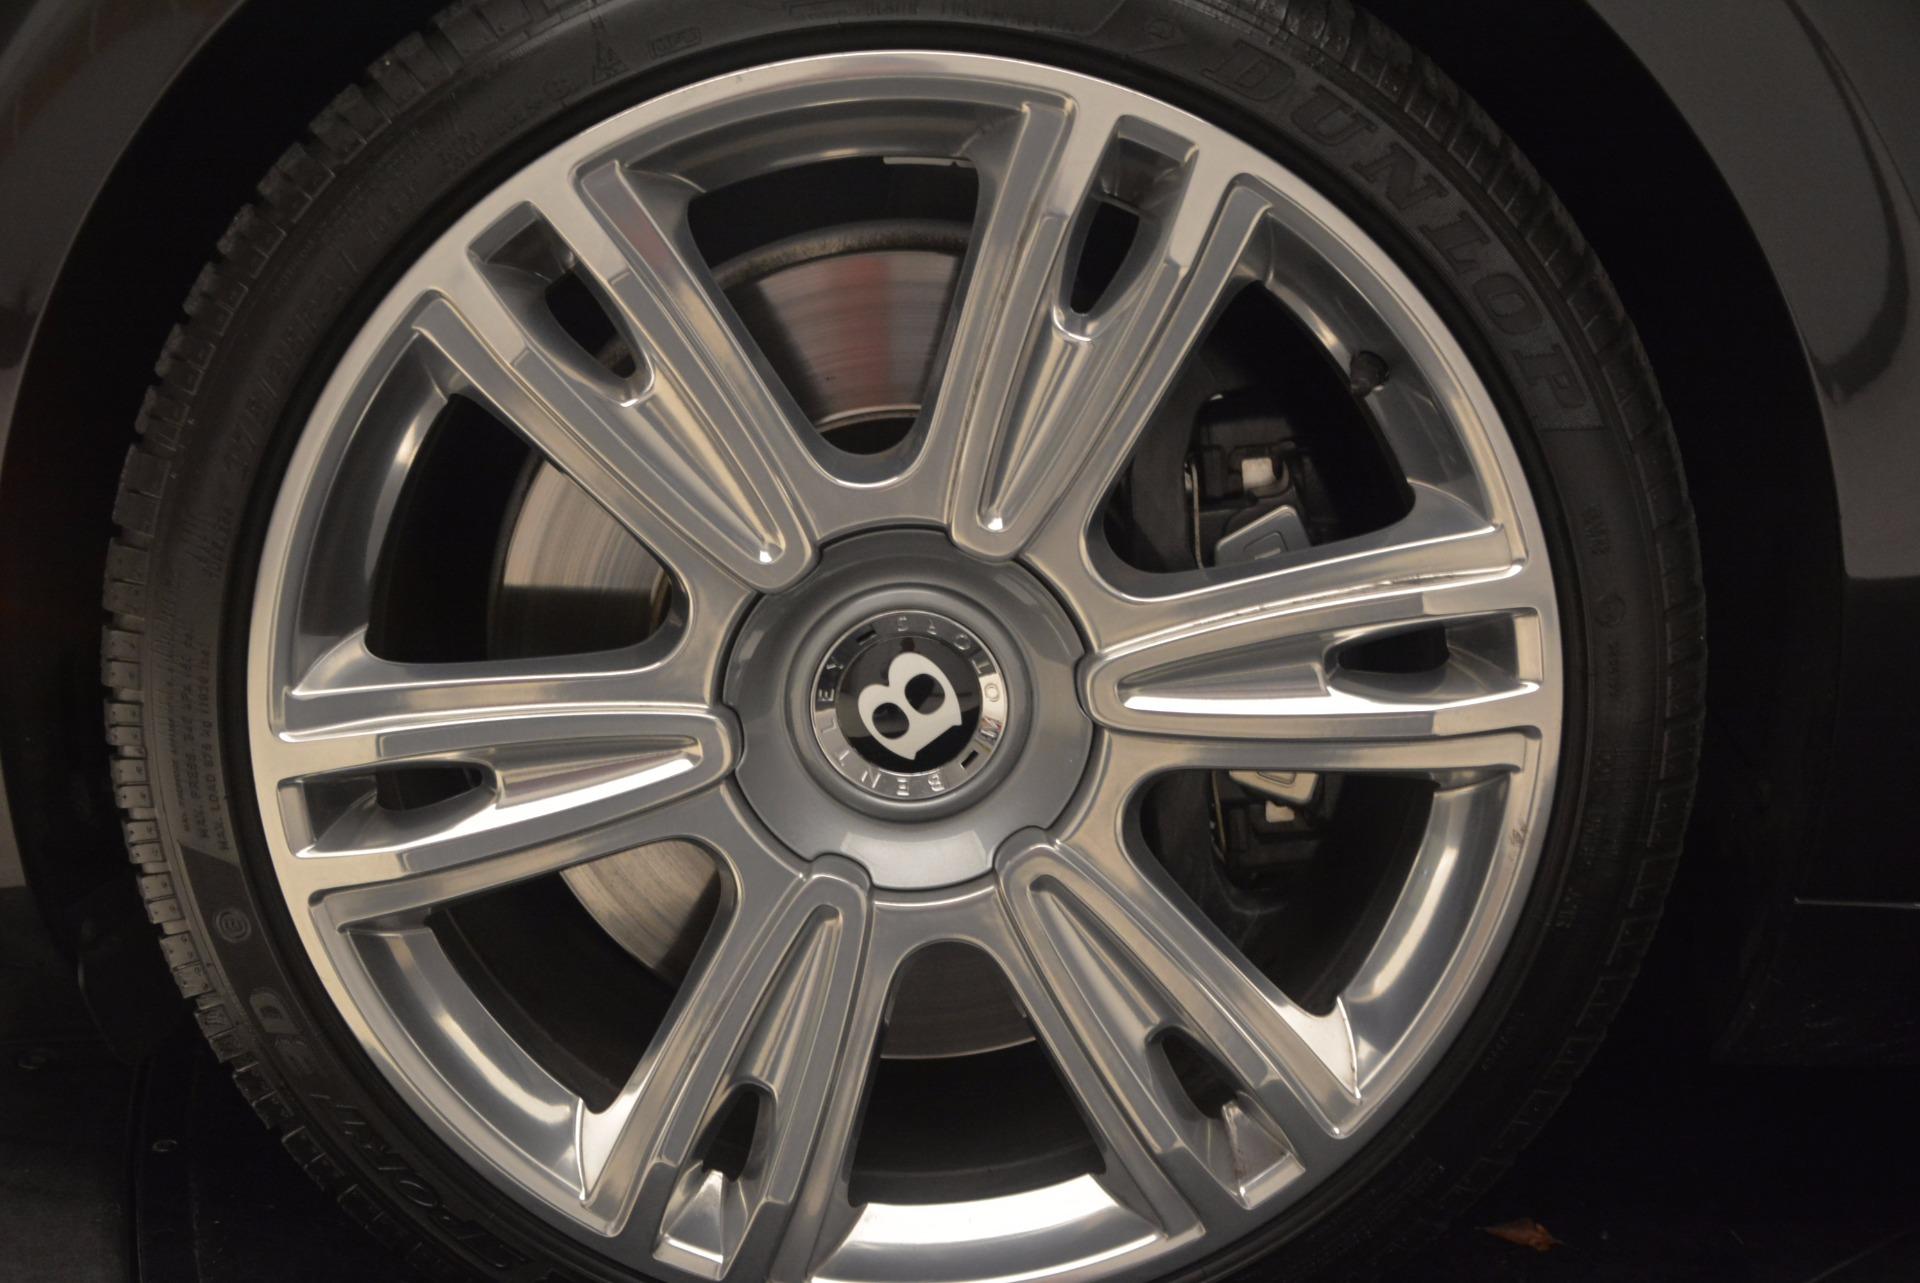 Used 2014 Bentley Flying Spur W12 For Sale In Westport, CT 1598_p22